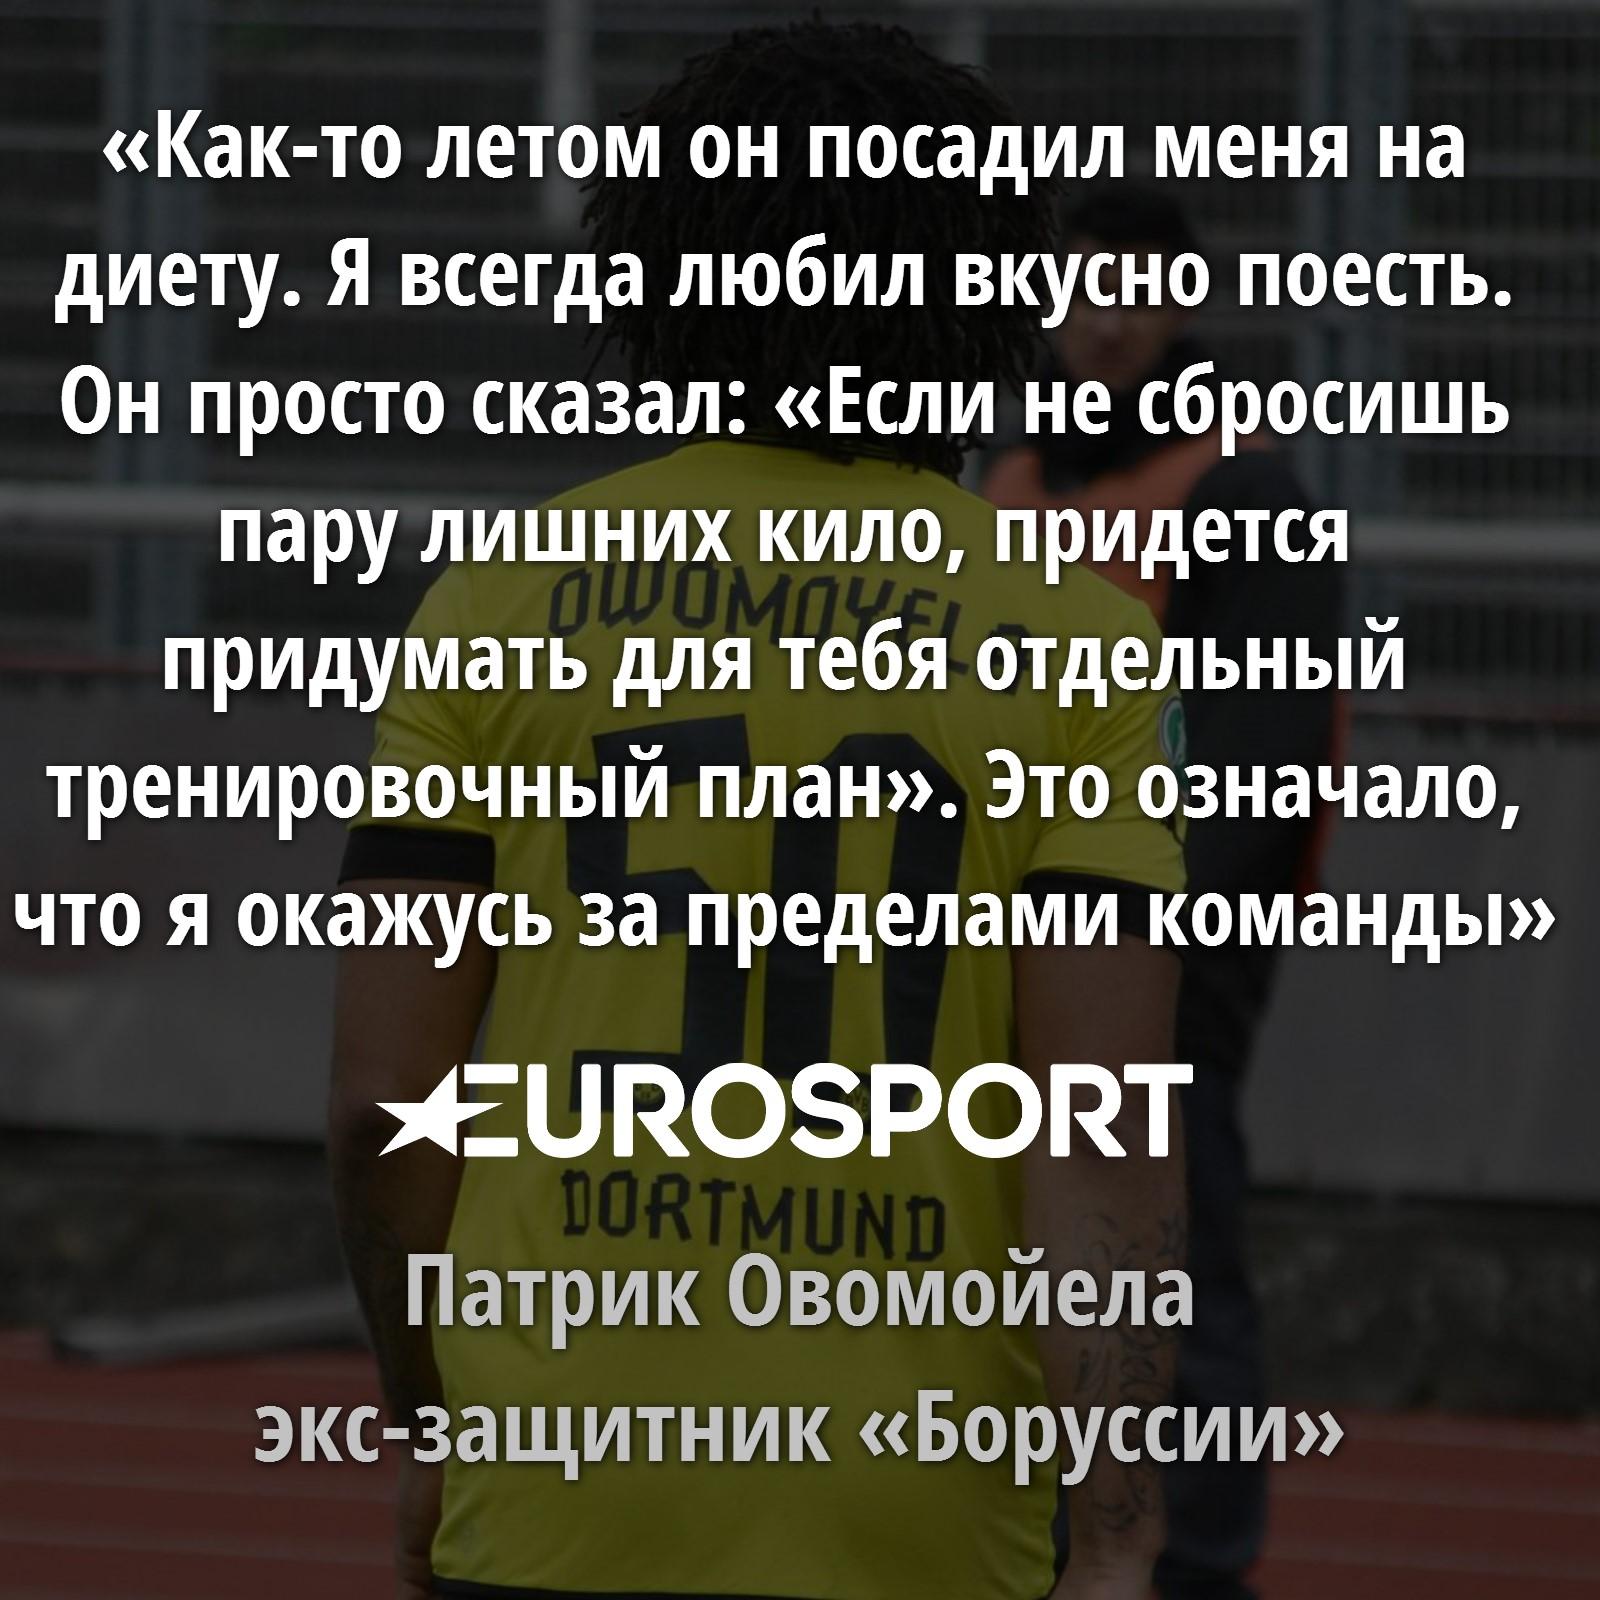 https://i.eurosport.com/2015/11/19/1735220.jpg